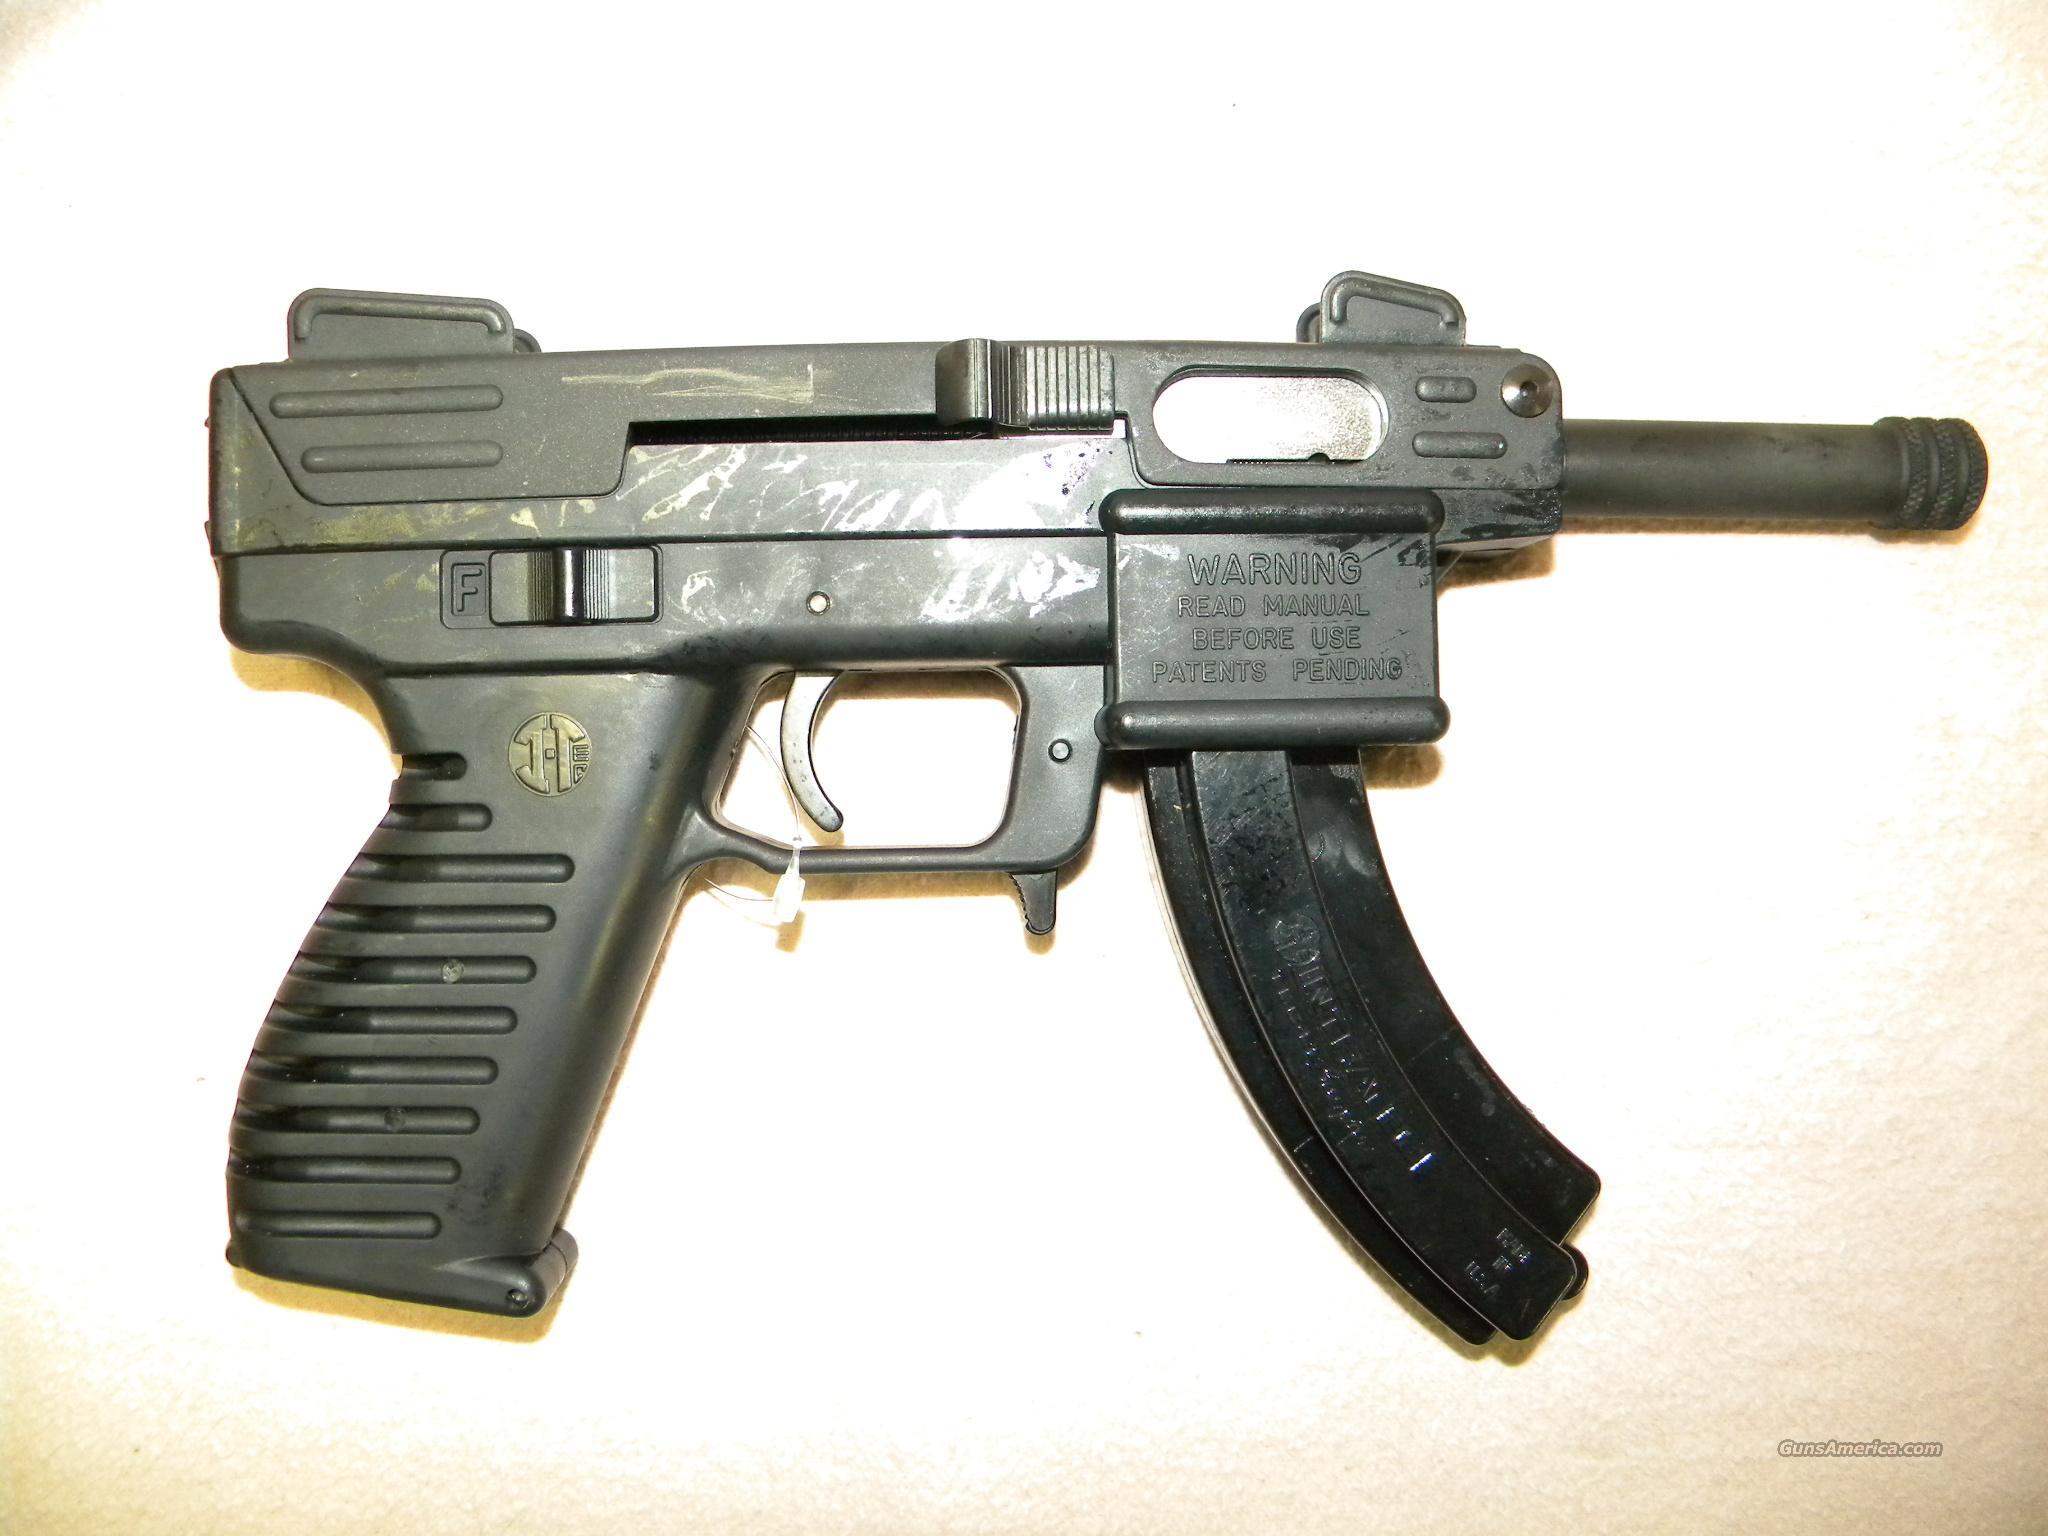 "Intratec TEC-22 ""Scorpion"", .22LR Pistol, Uses Ruger 10/22 Mags!  Guns > Pistols > Intratec Pistols"